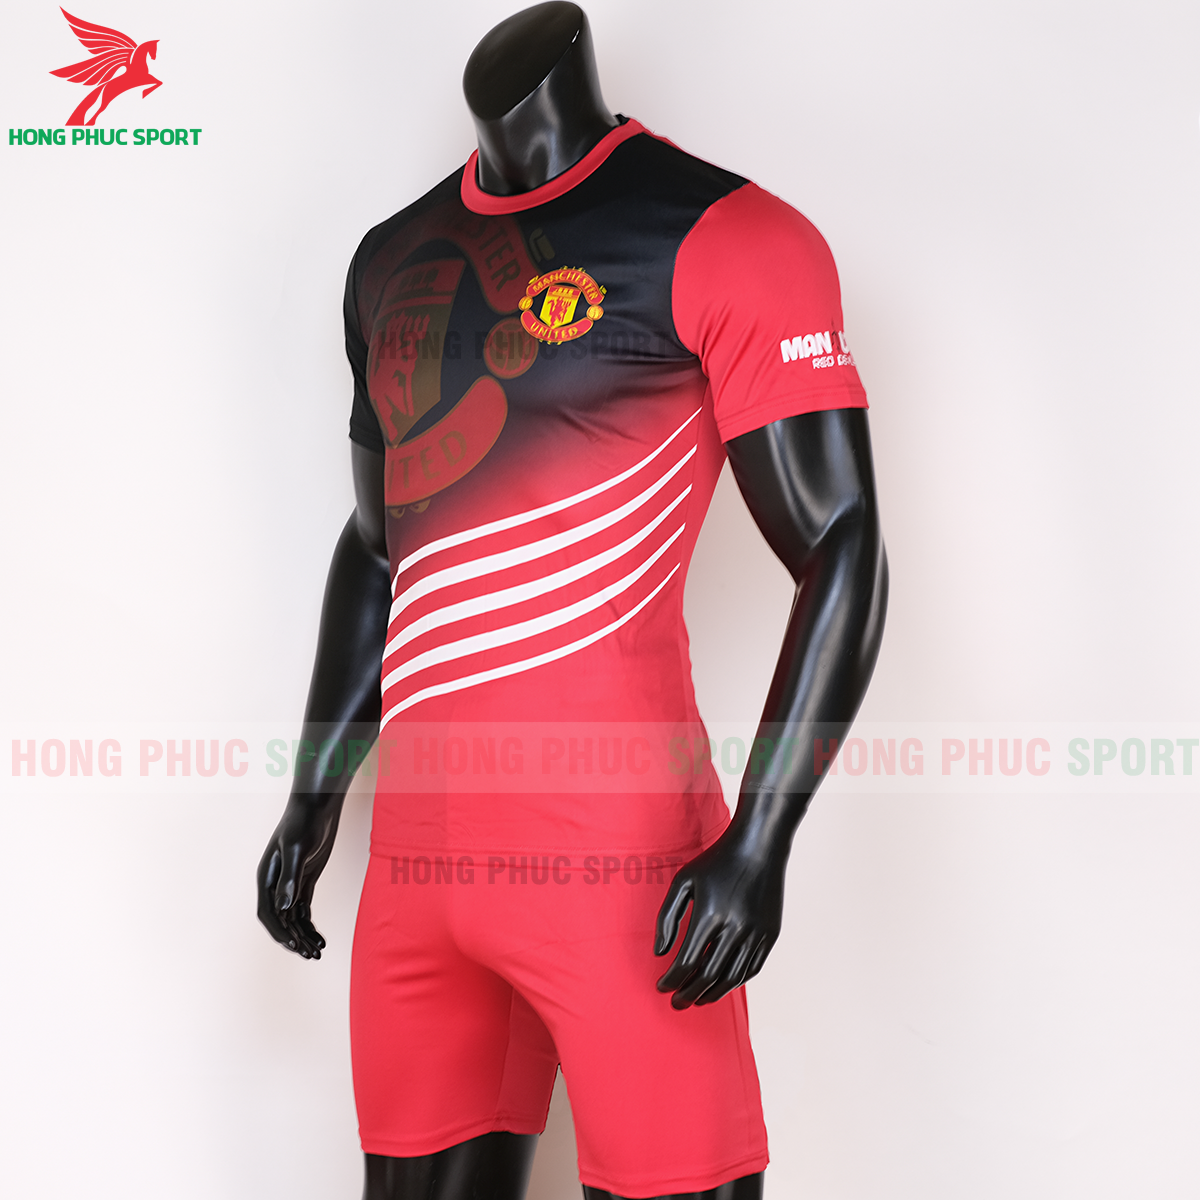 https://cdn.hongphucsport.com/unsafe/s4.shopbay.vn/files/285/ao-manchester-united-2020-2021-phien-ban-fan-phai-5f6c0e38d51b6.png